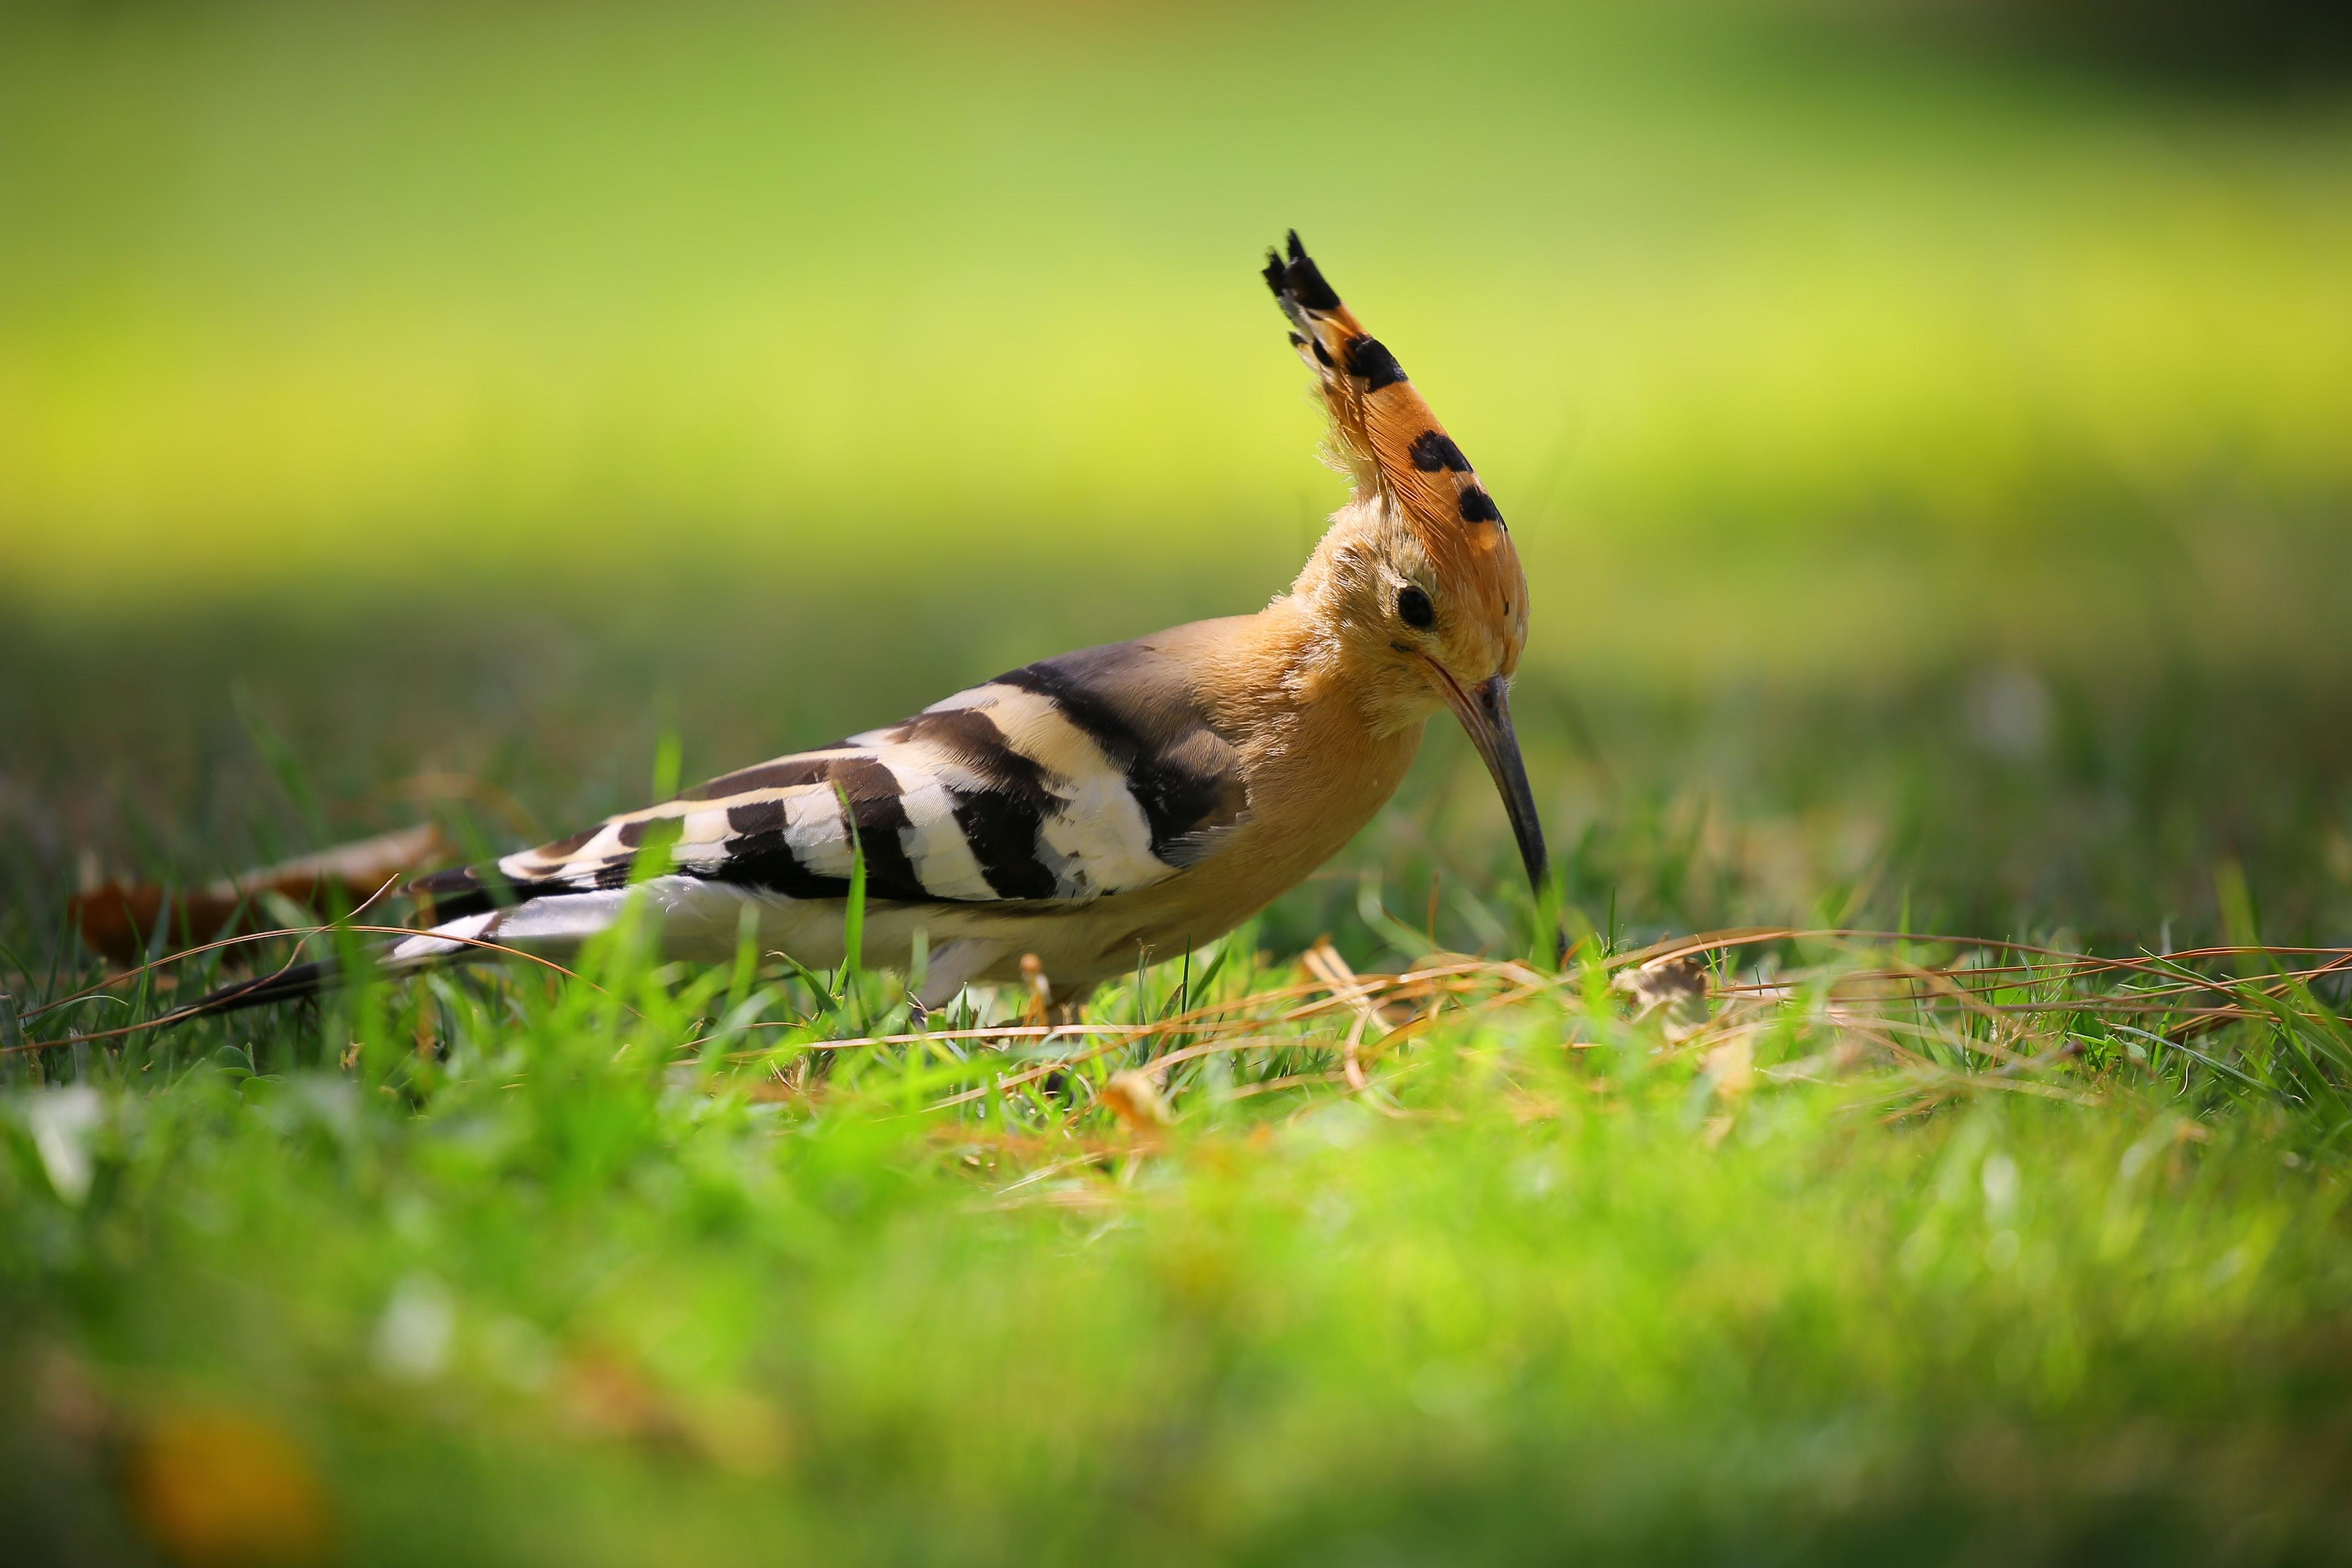 Selective Focus Photography of Brown Black and White Long Beak Bird on Green Grass, Animal, Avian, Bird, Cute, HQ Photo